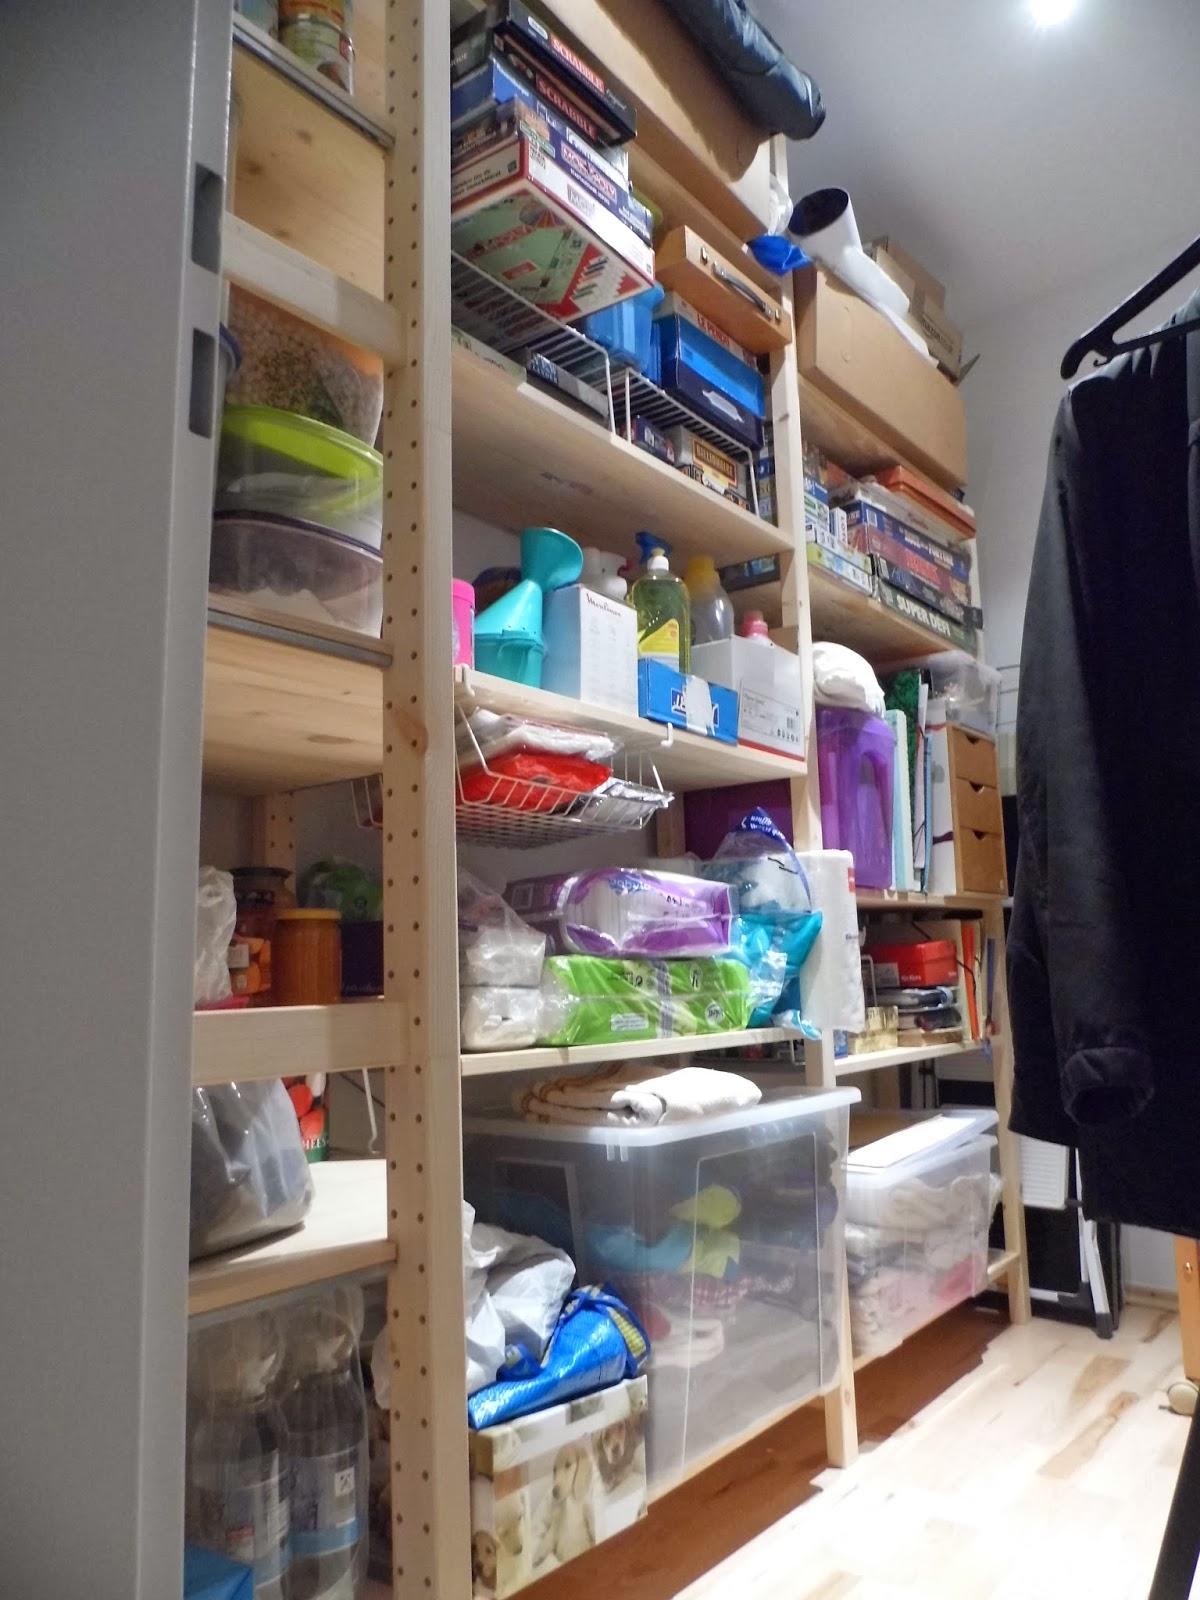 la cit des vents un cellier bien rang a tidy cellar. Black Bedroom Furniture Sets. Home Design Ideas